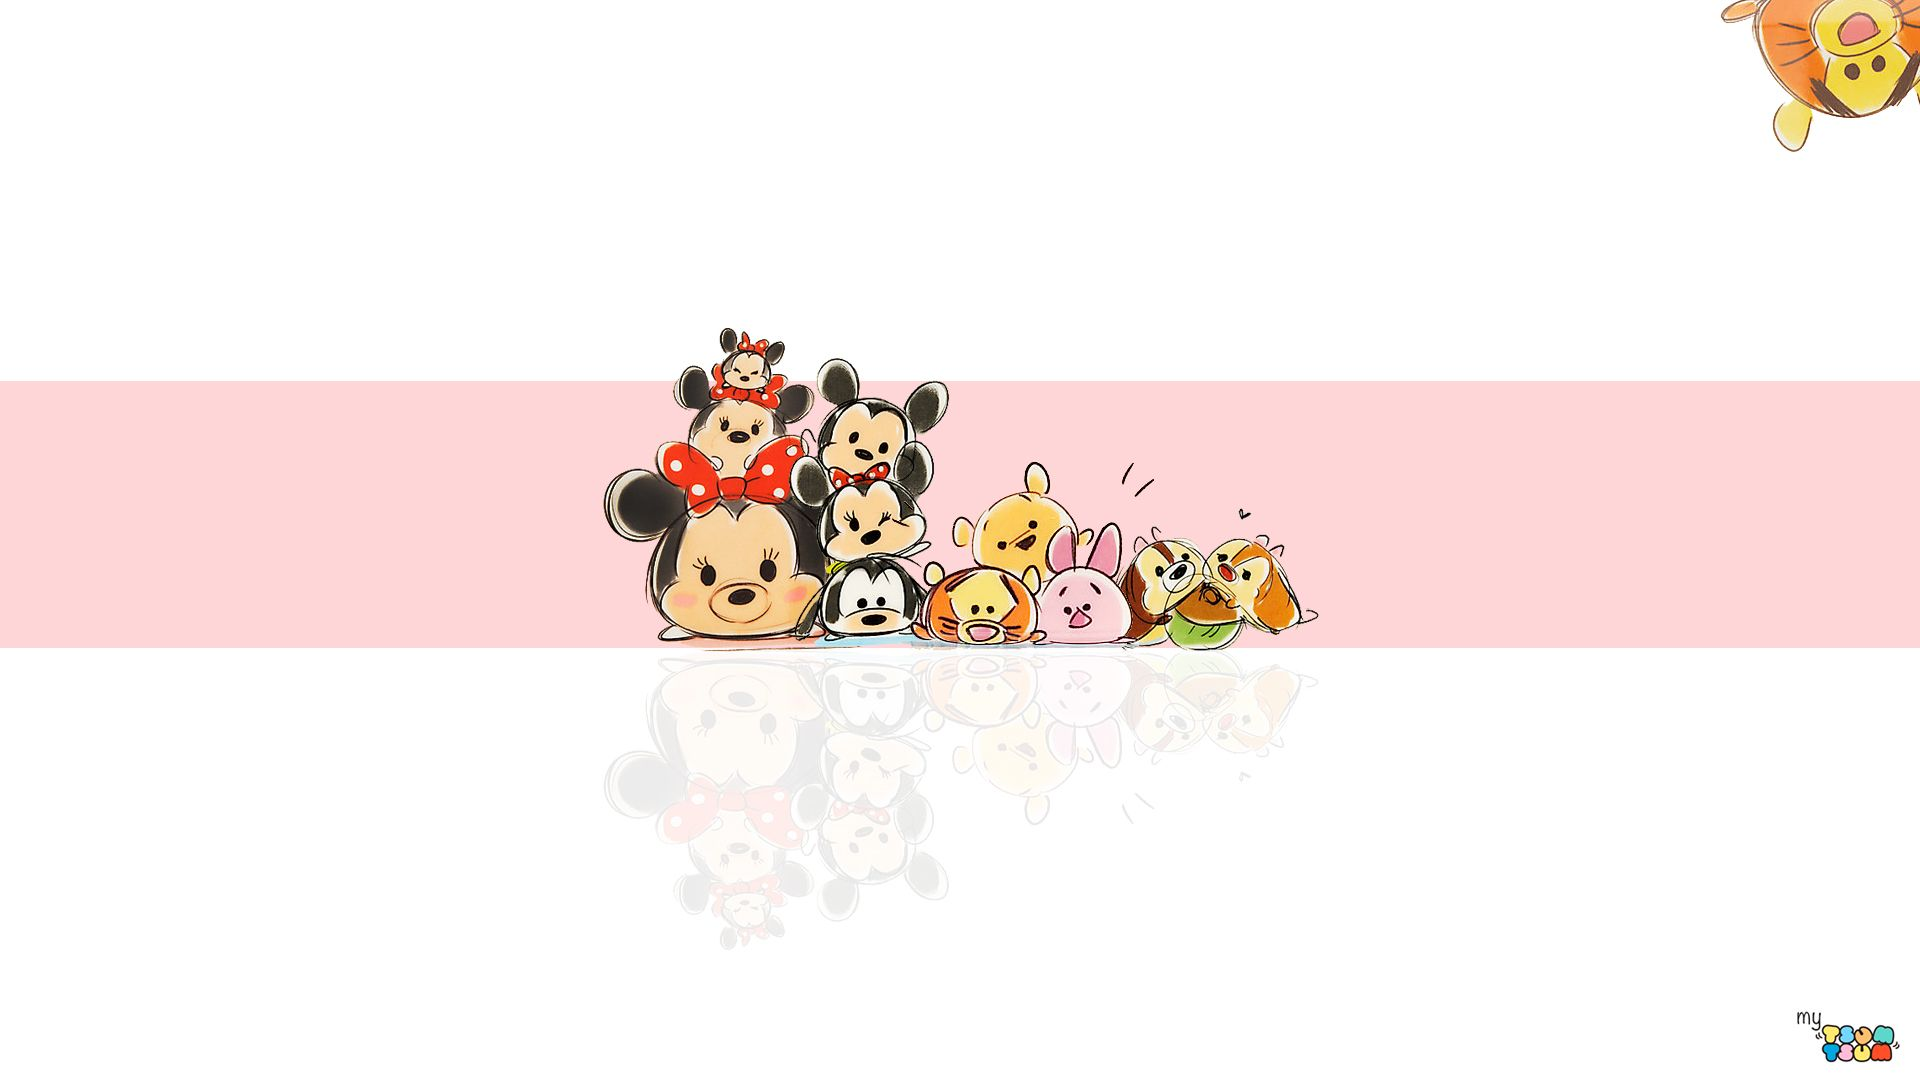 My Tsum Tsum Wallpaper Pink Tsum Tsum Wallpaper Character Wallpaper Disney Tsum Tsum